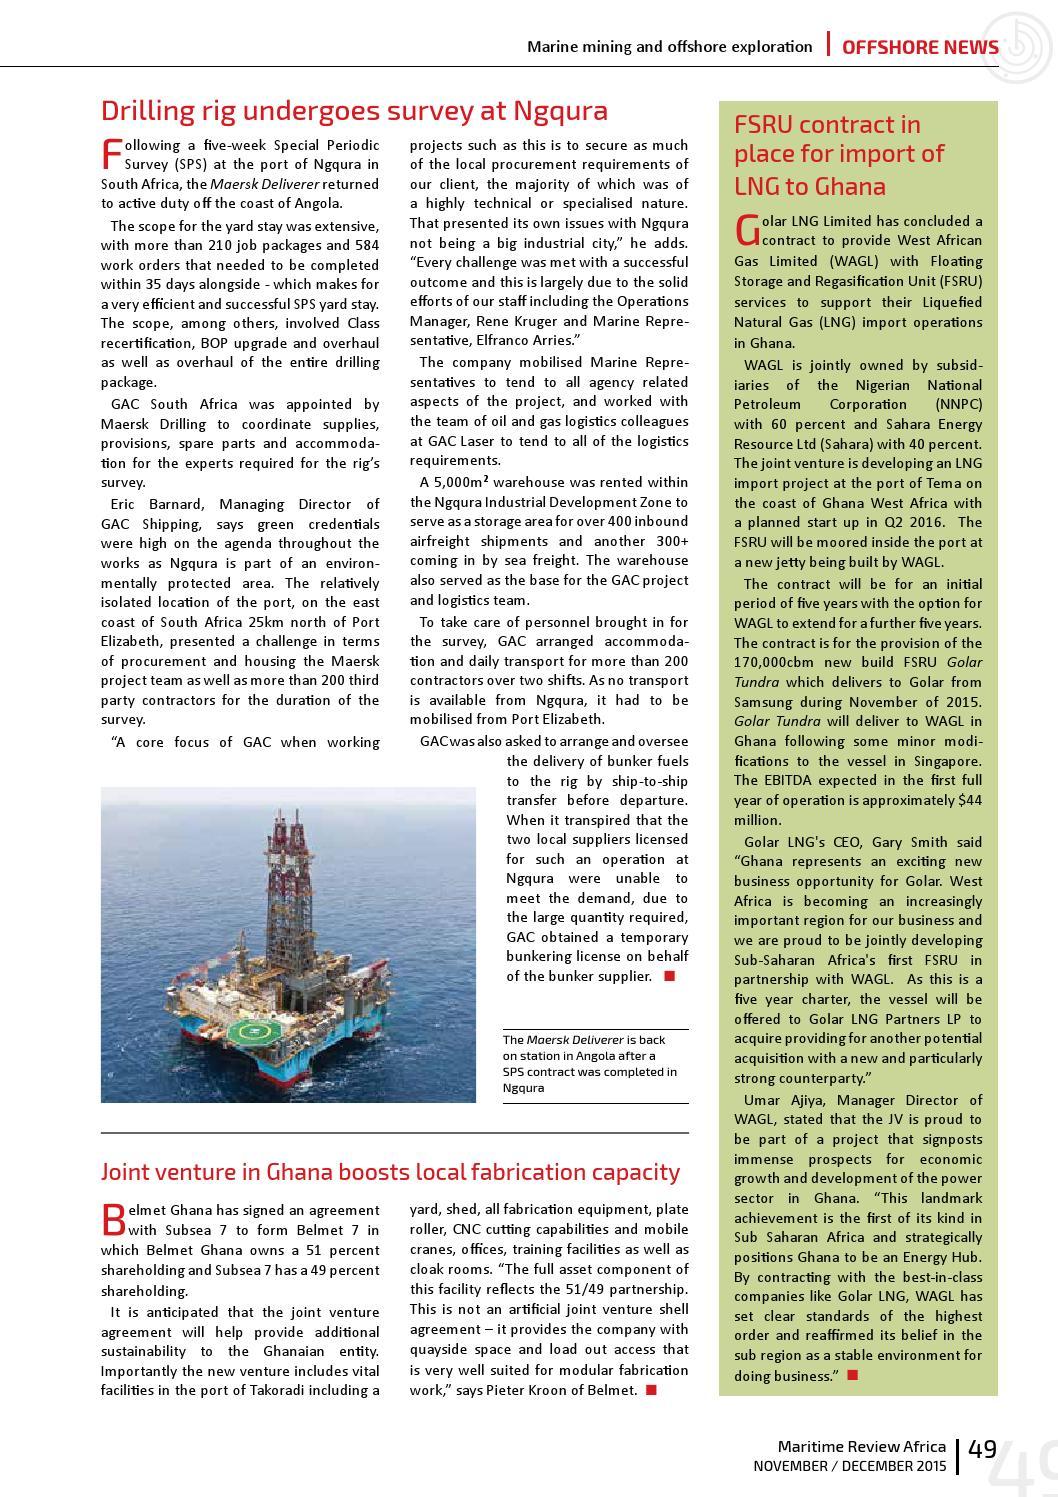 Maritime Review Novdec 2015 By More Maximum Media